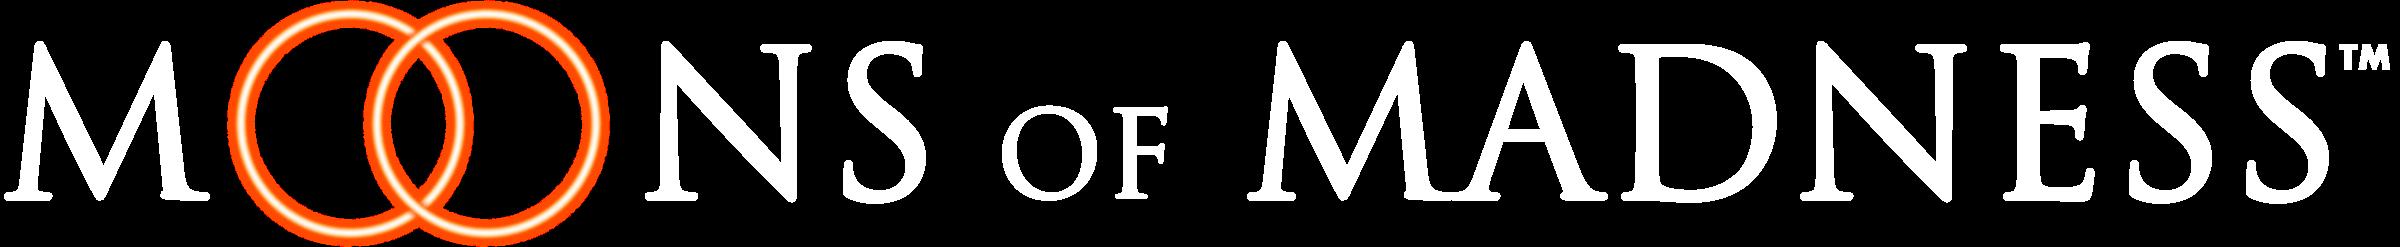 moons-logo3